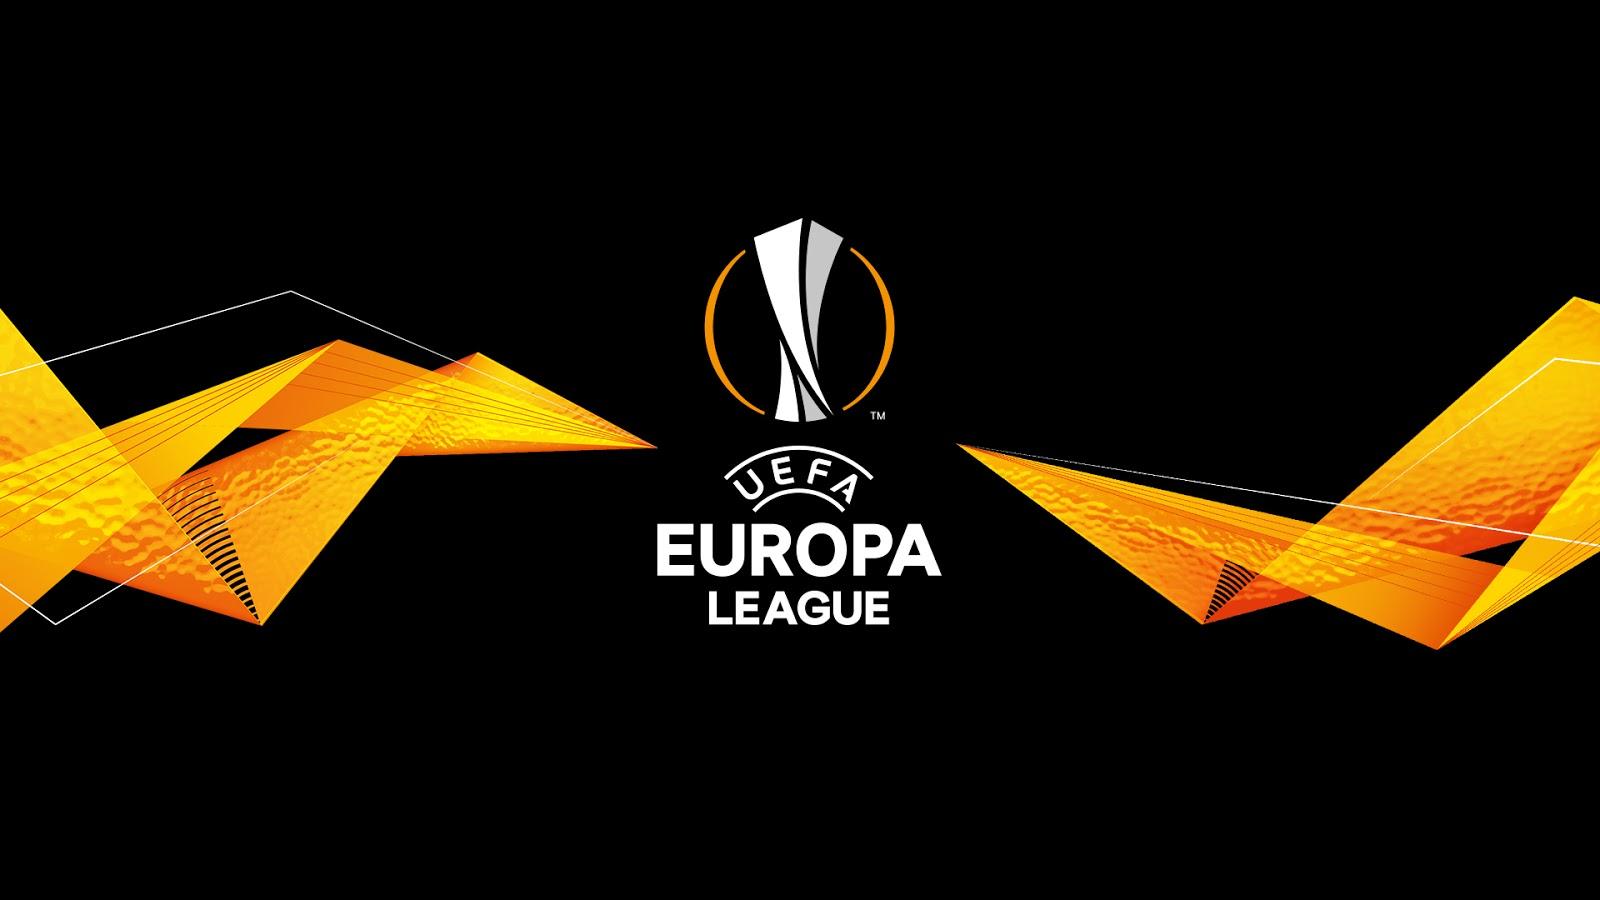 europa-league-branding%2B%25281%2529.jpg